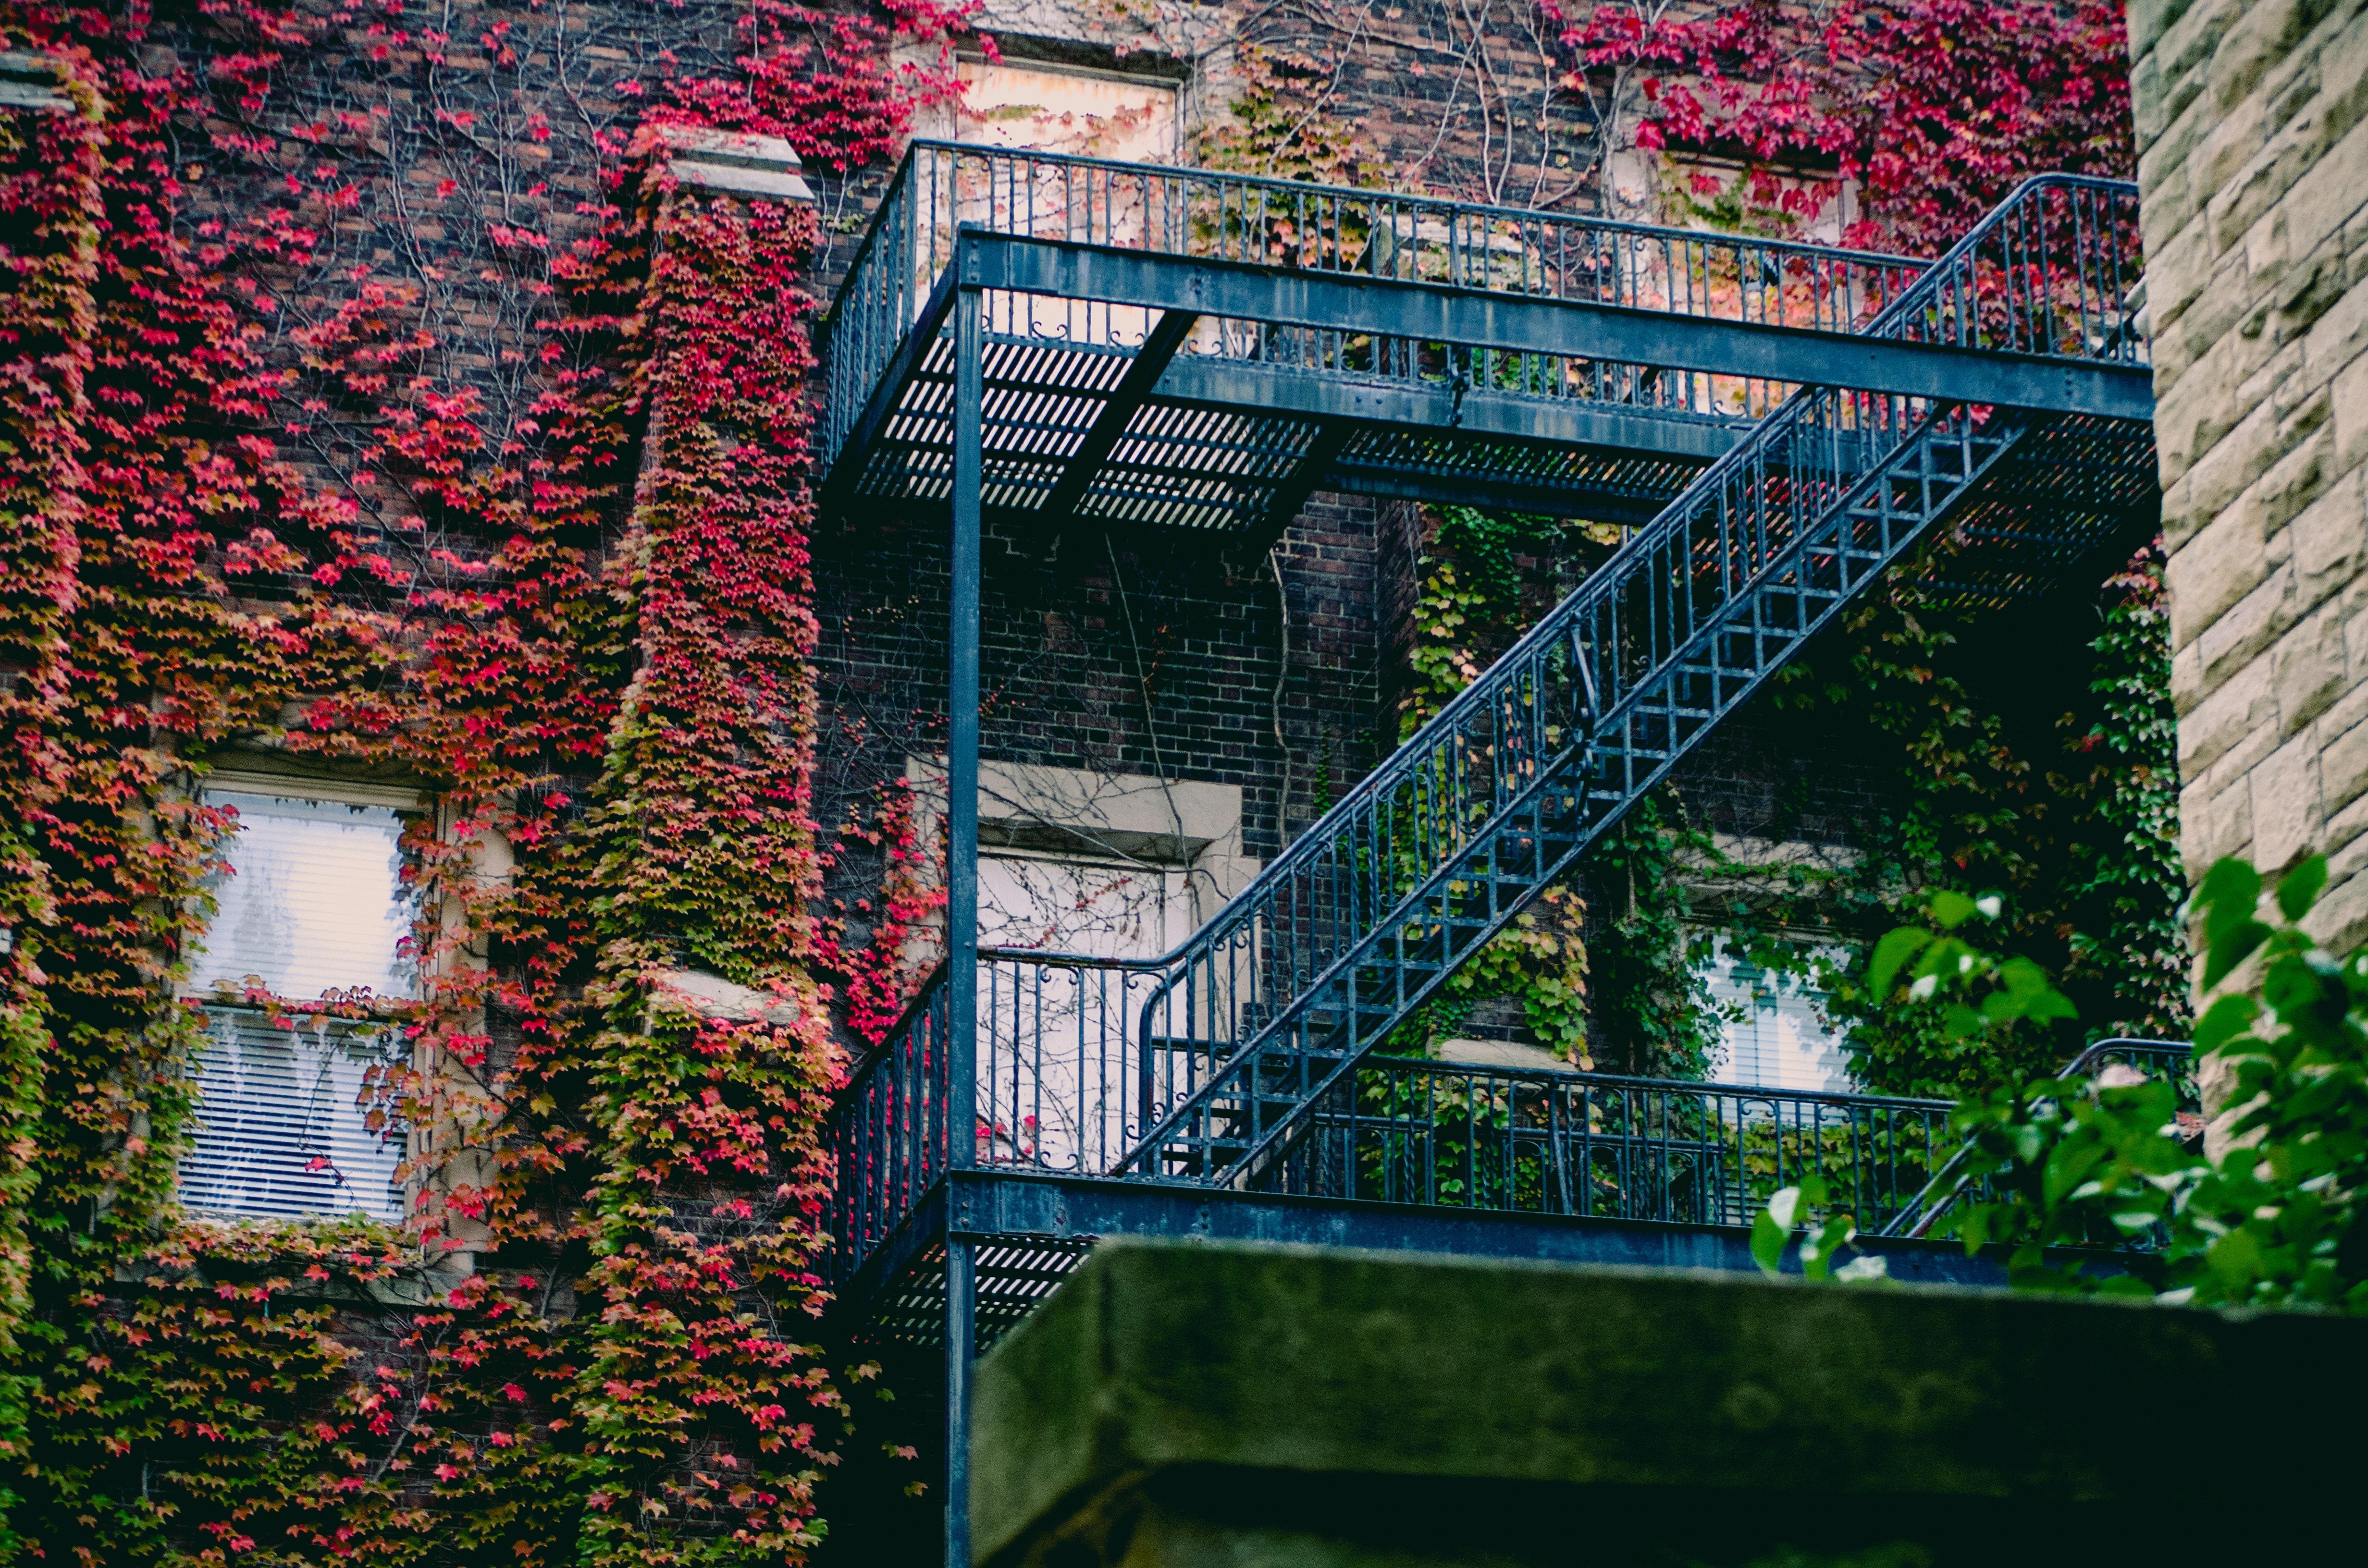 Blue metal ladder photo